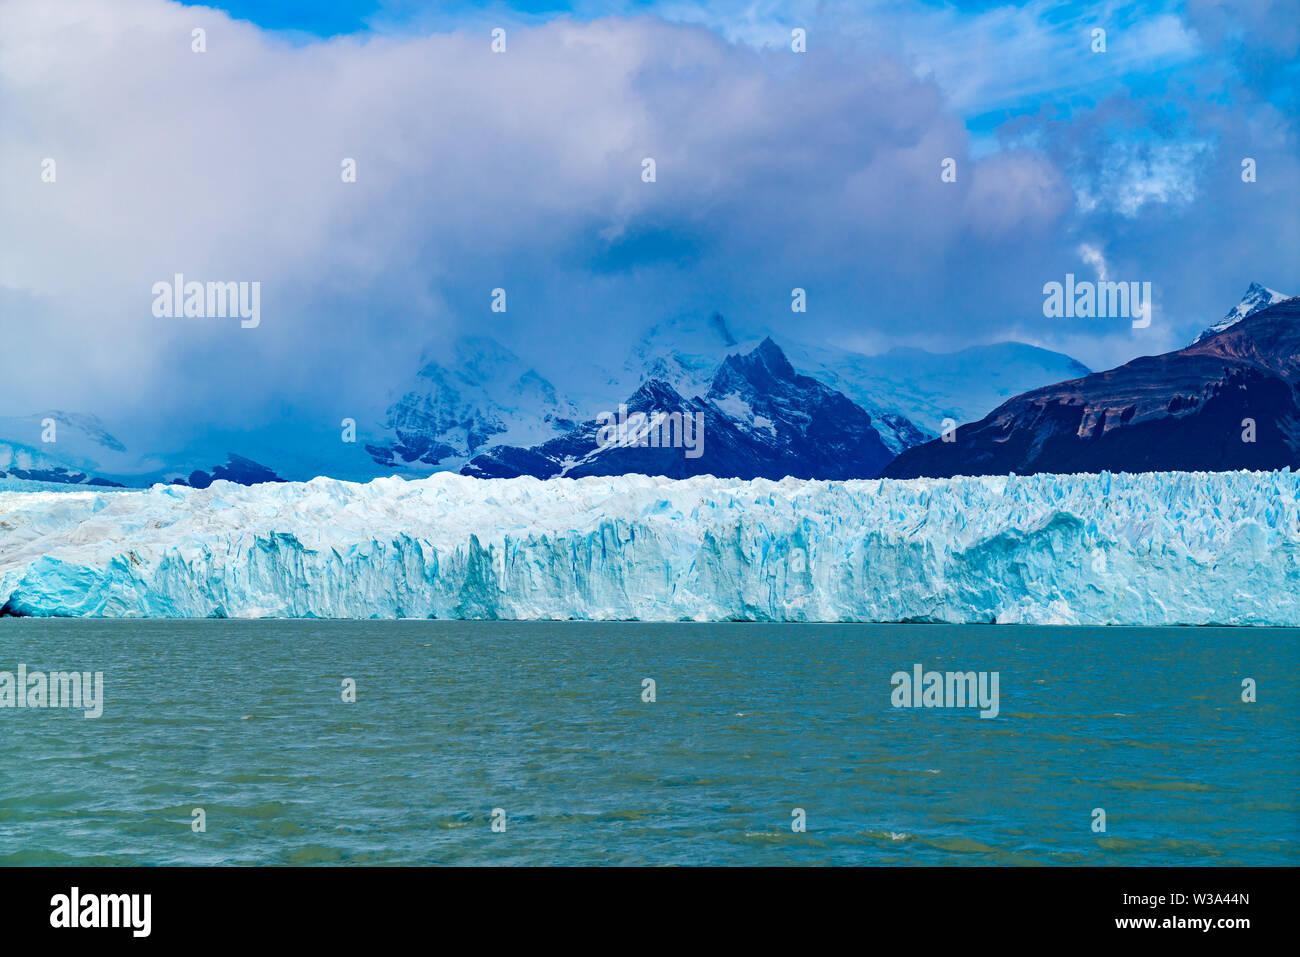 Perito Moreno Glacier in Loa Glaciares National Park in Patagonia Argentina - Stock Image